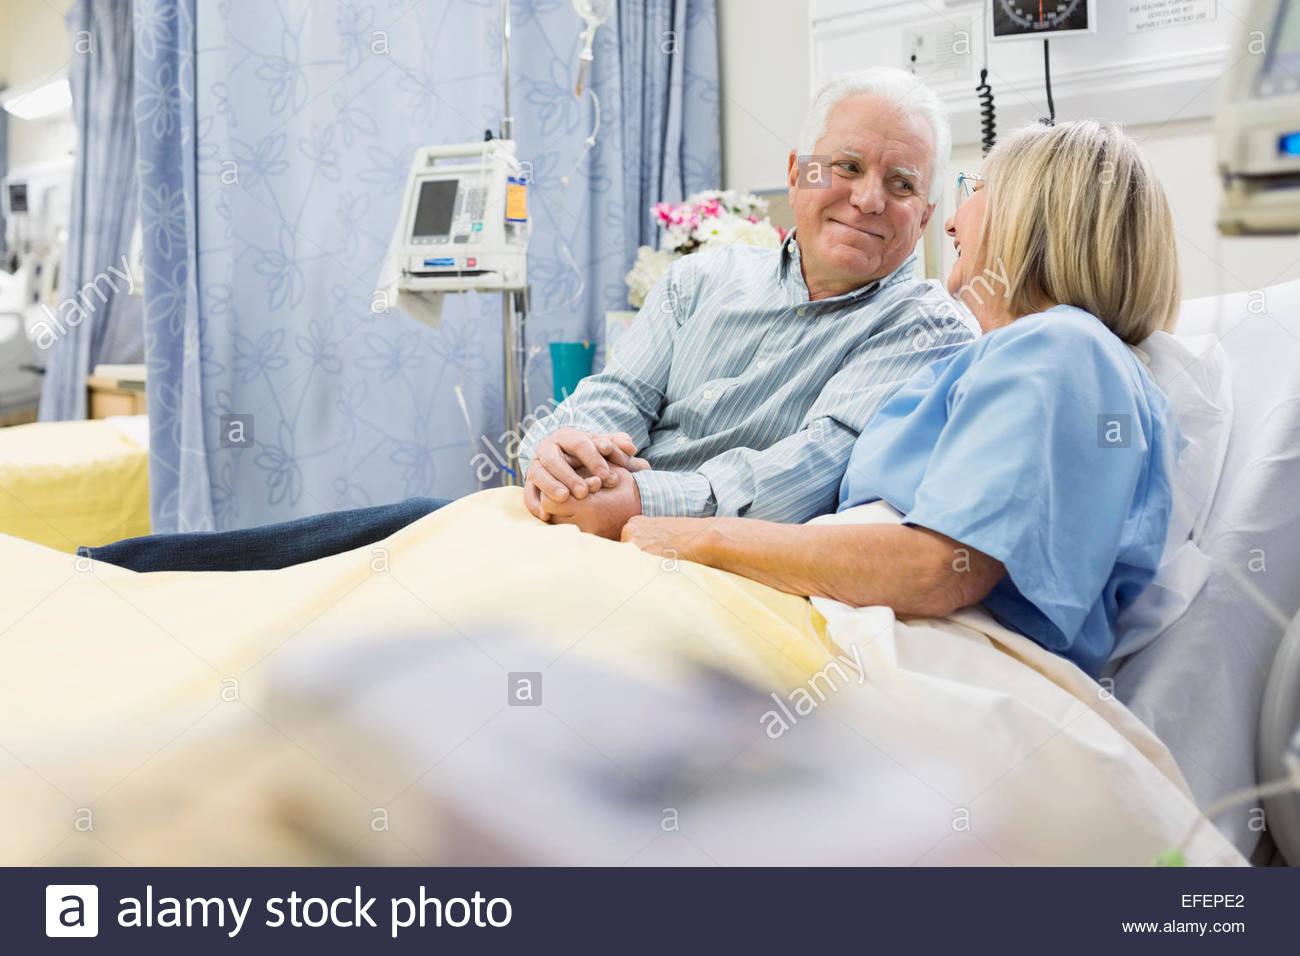 Mari et femme holding hands in hospital bed Photo Stock